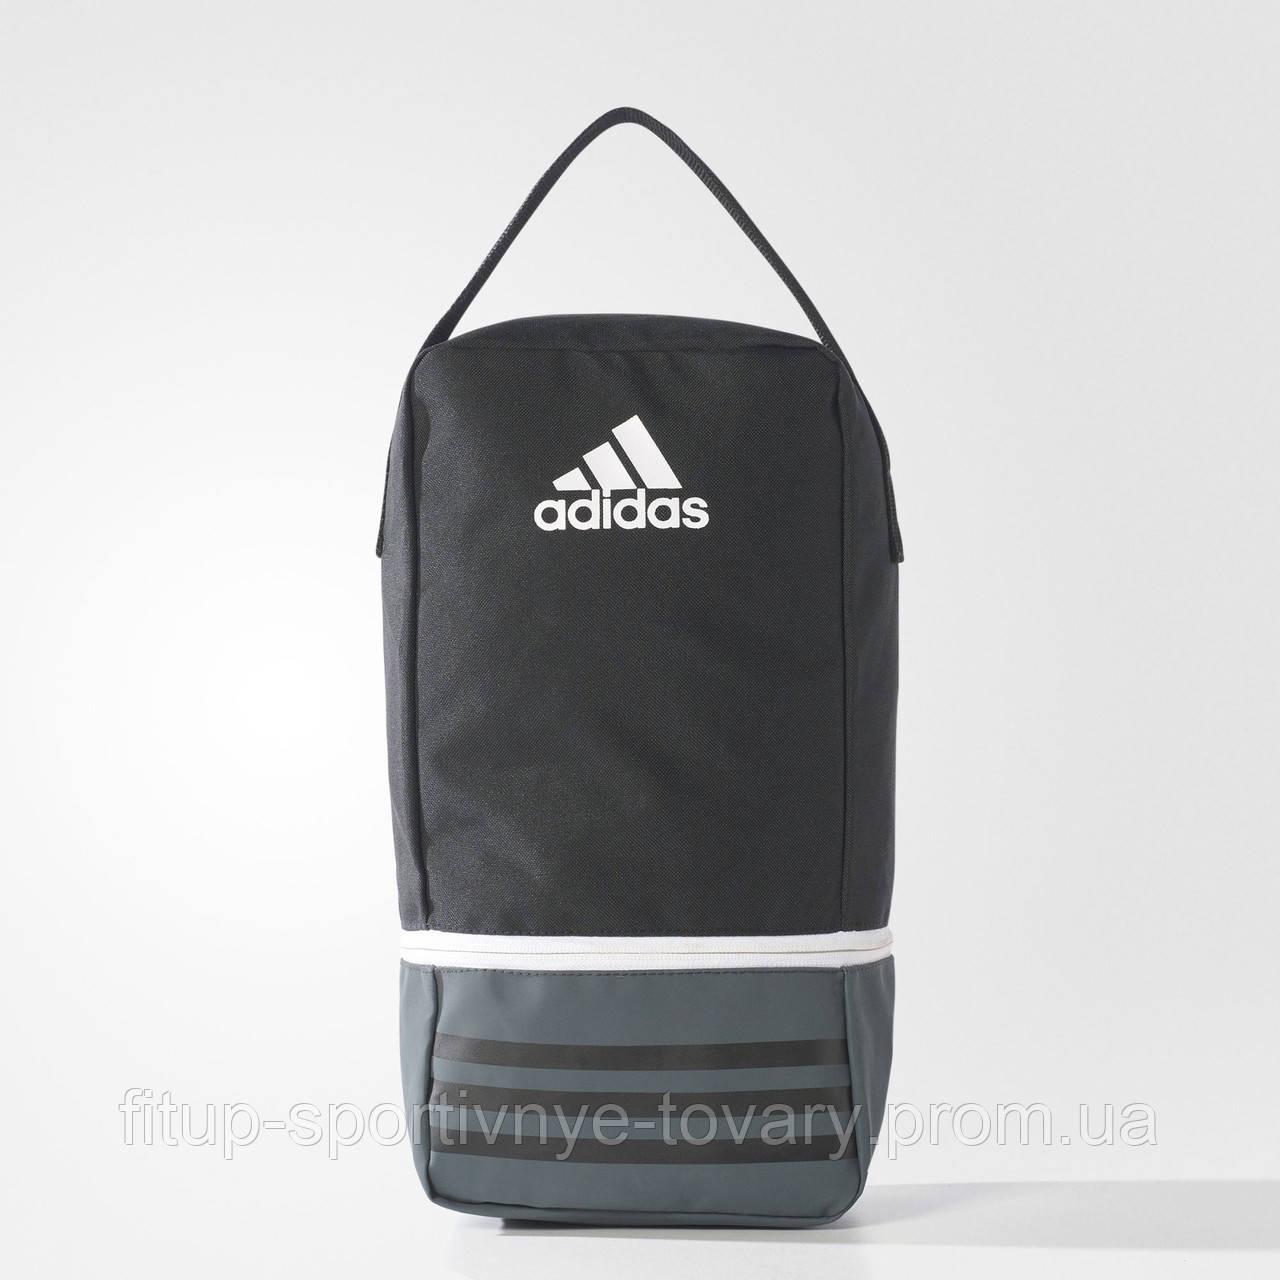 13ef98797e25 Сумка для обуви Adidas TIRO SB B46133: продажа, цена в Киеве ...